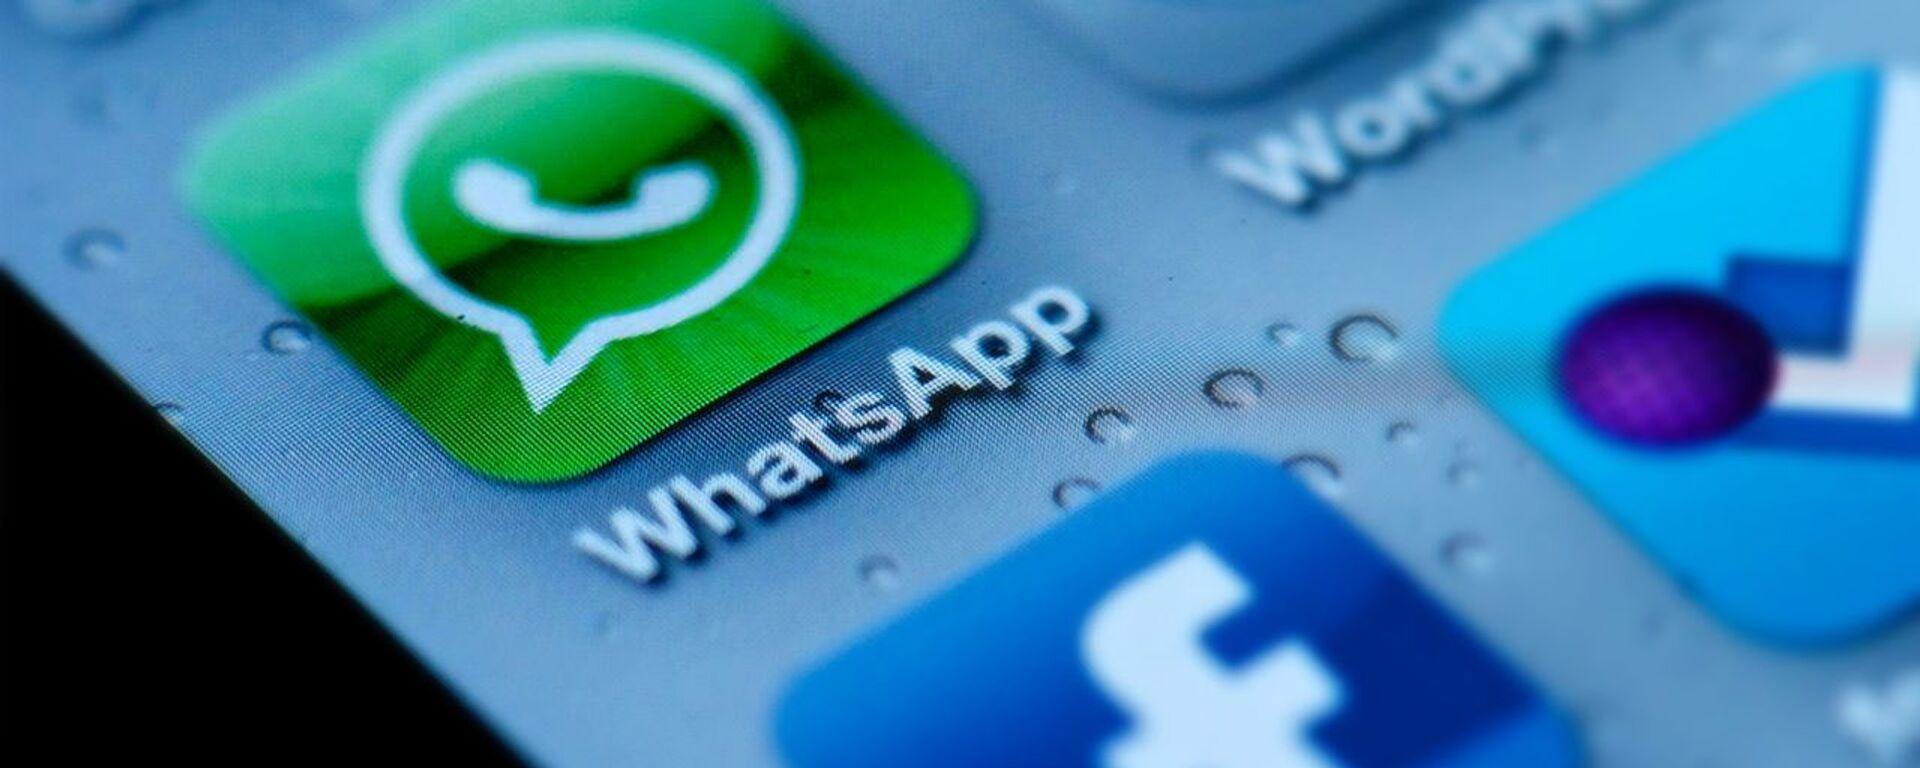 Messenger WhatsApp  - Sputnik Česká republika, 1920, 03.06.2021